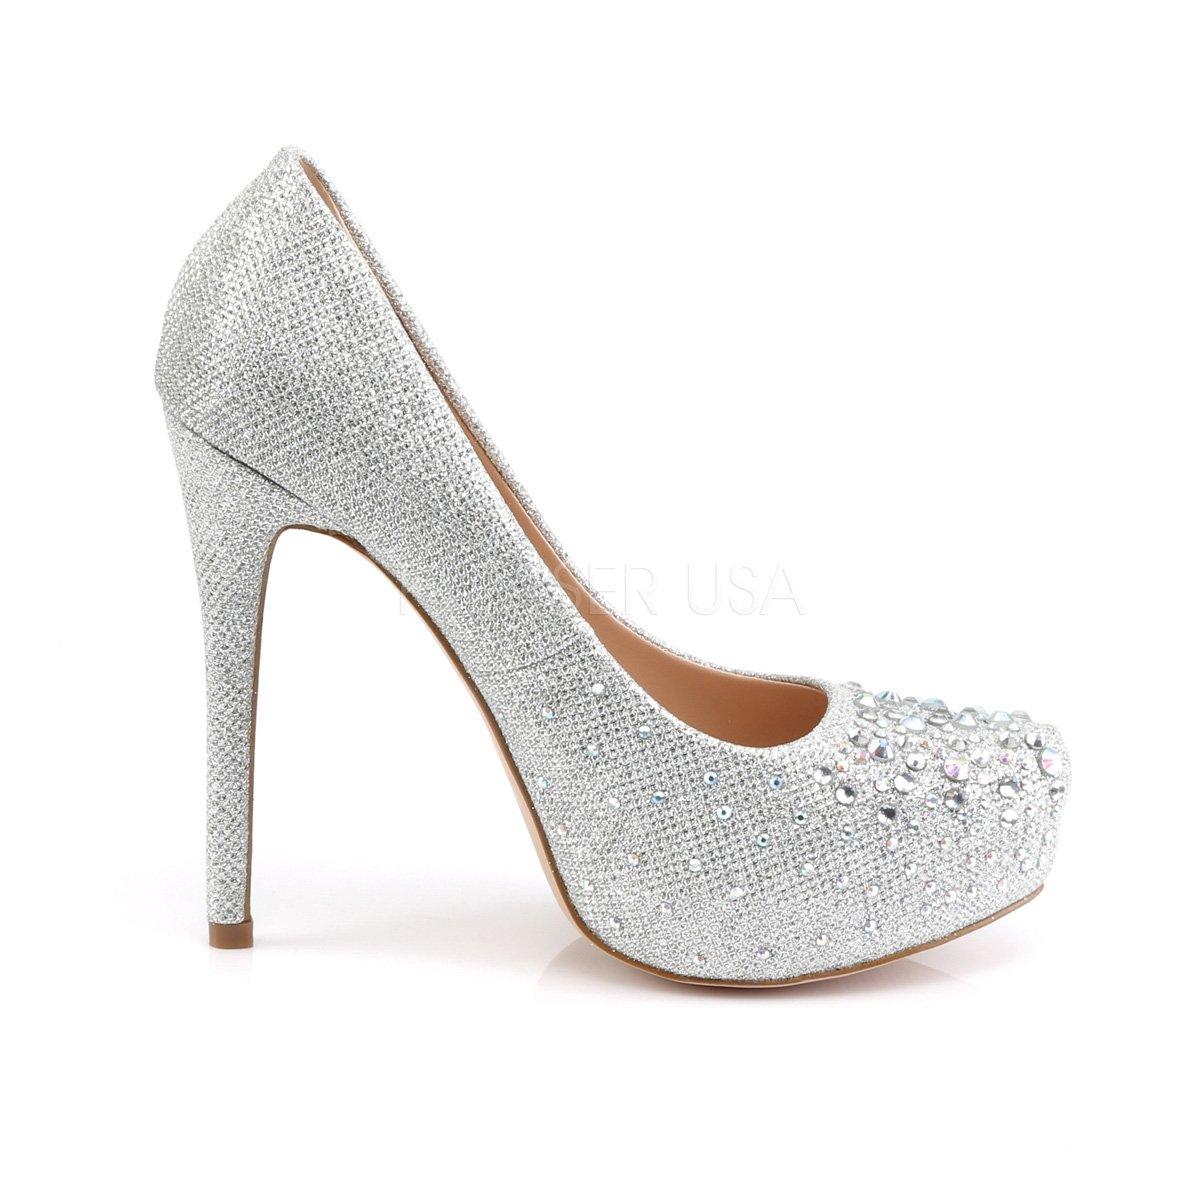 Higher-Heels, Scarpe con plateau donna (argento)  Argento (argento) donna 917855